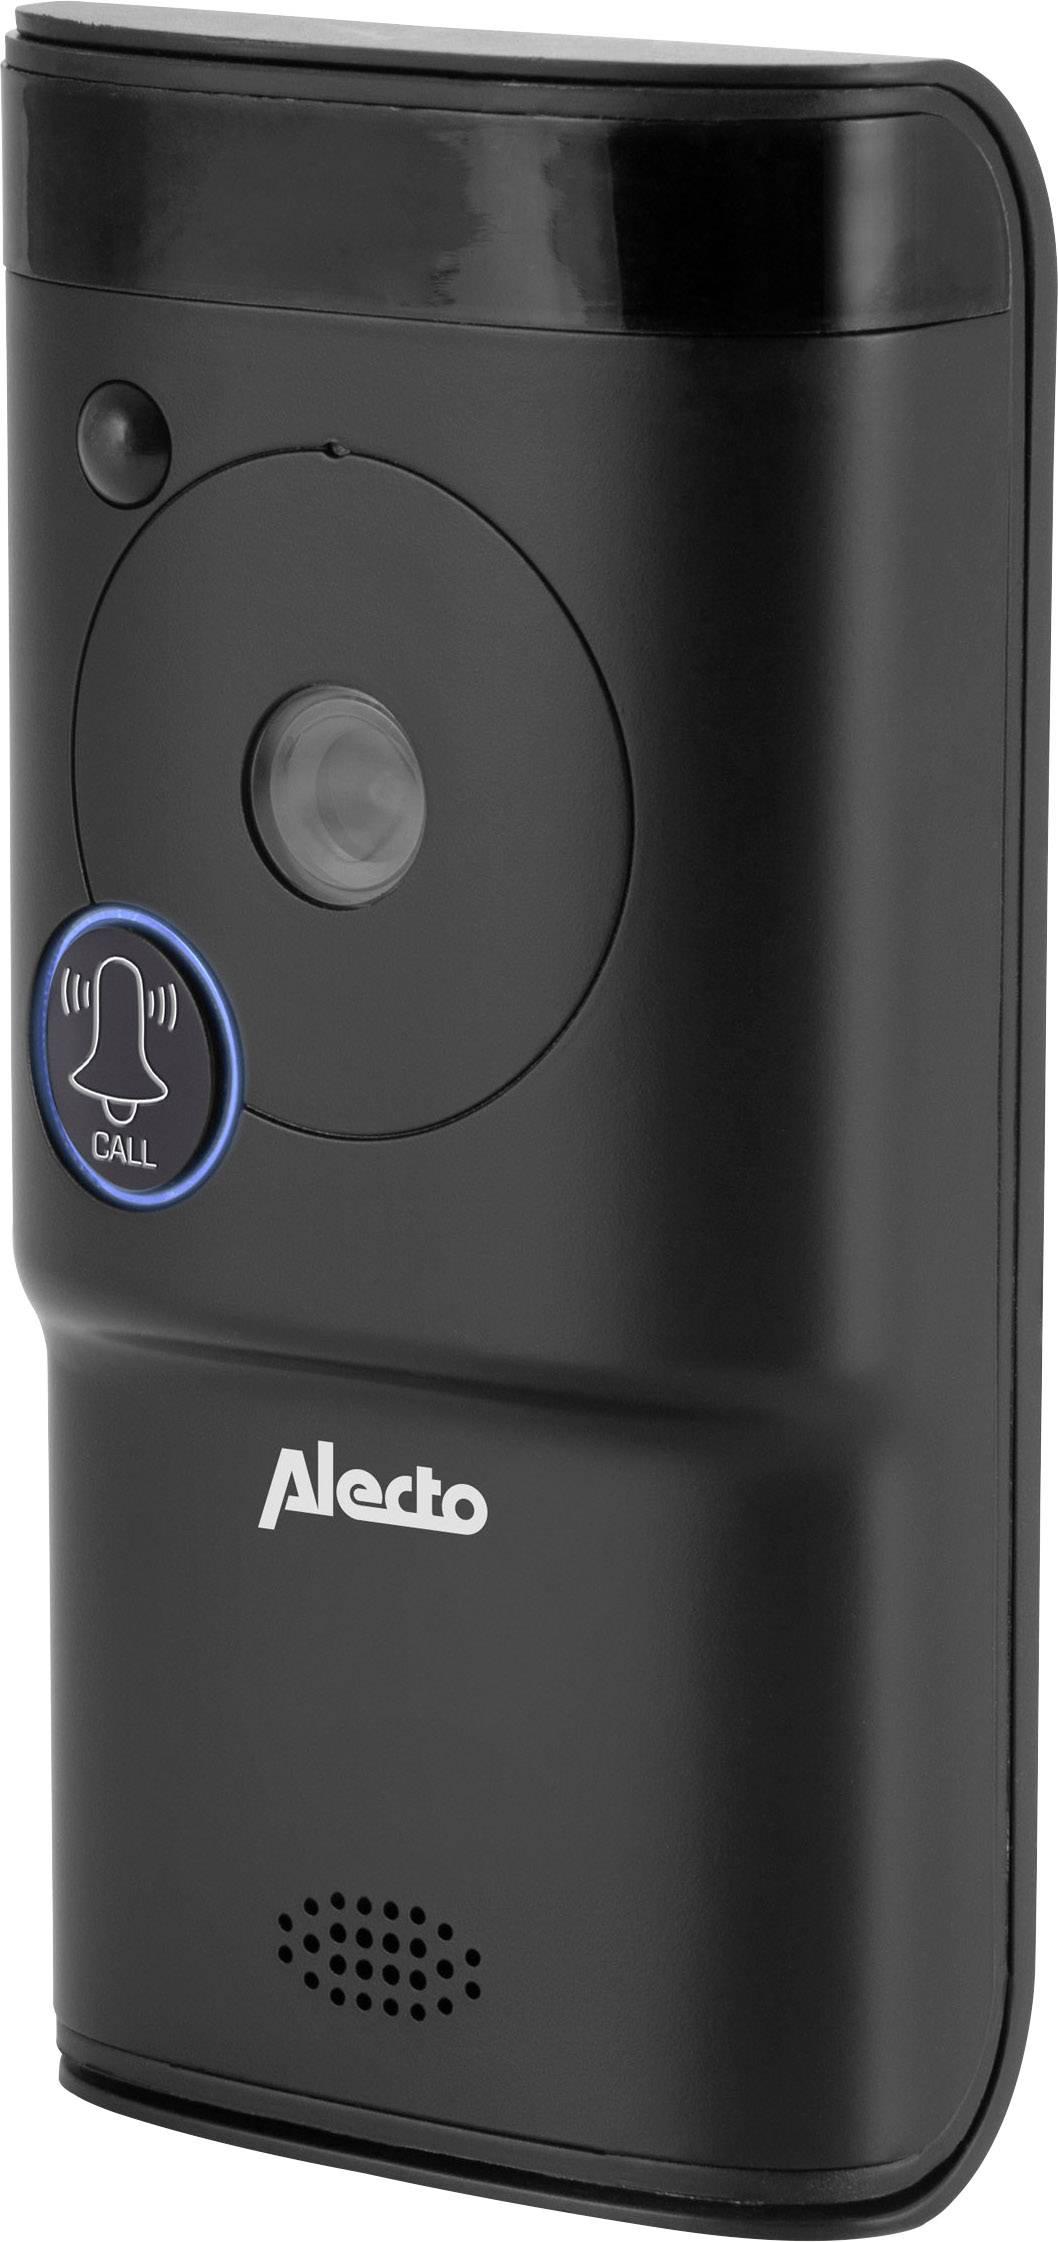 Alecto Dvc 1000 Wifi Deurbel Met Video Wifi Buitenunit Voor Zwart